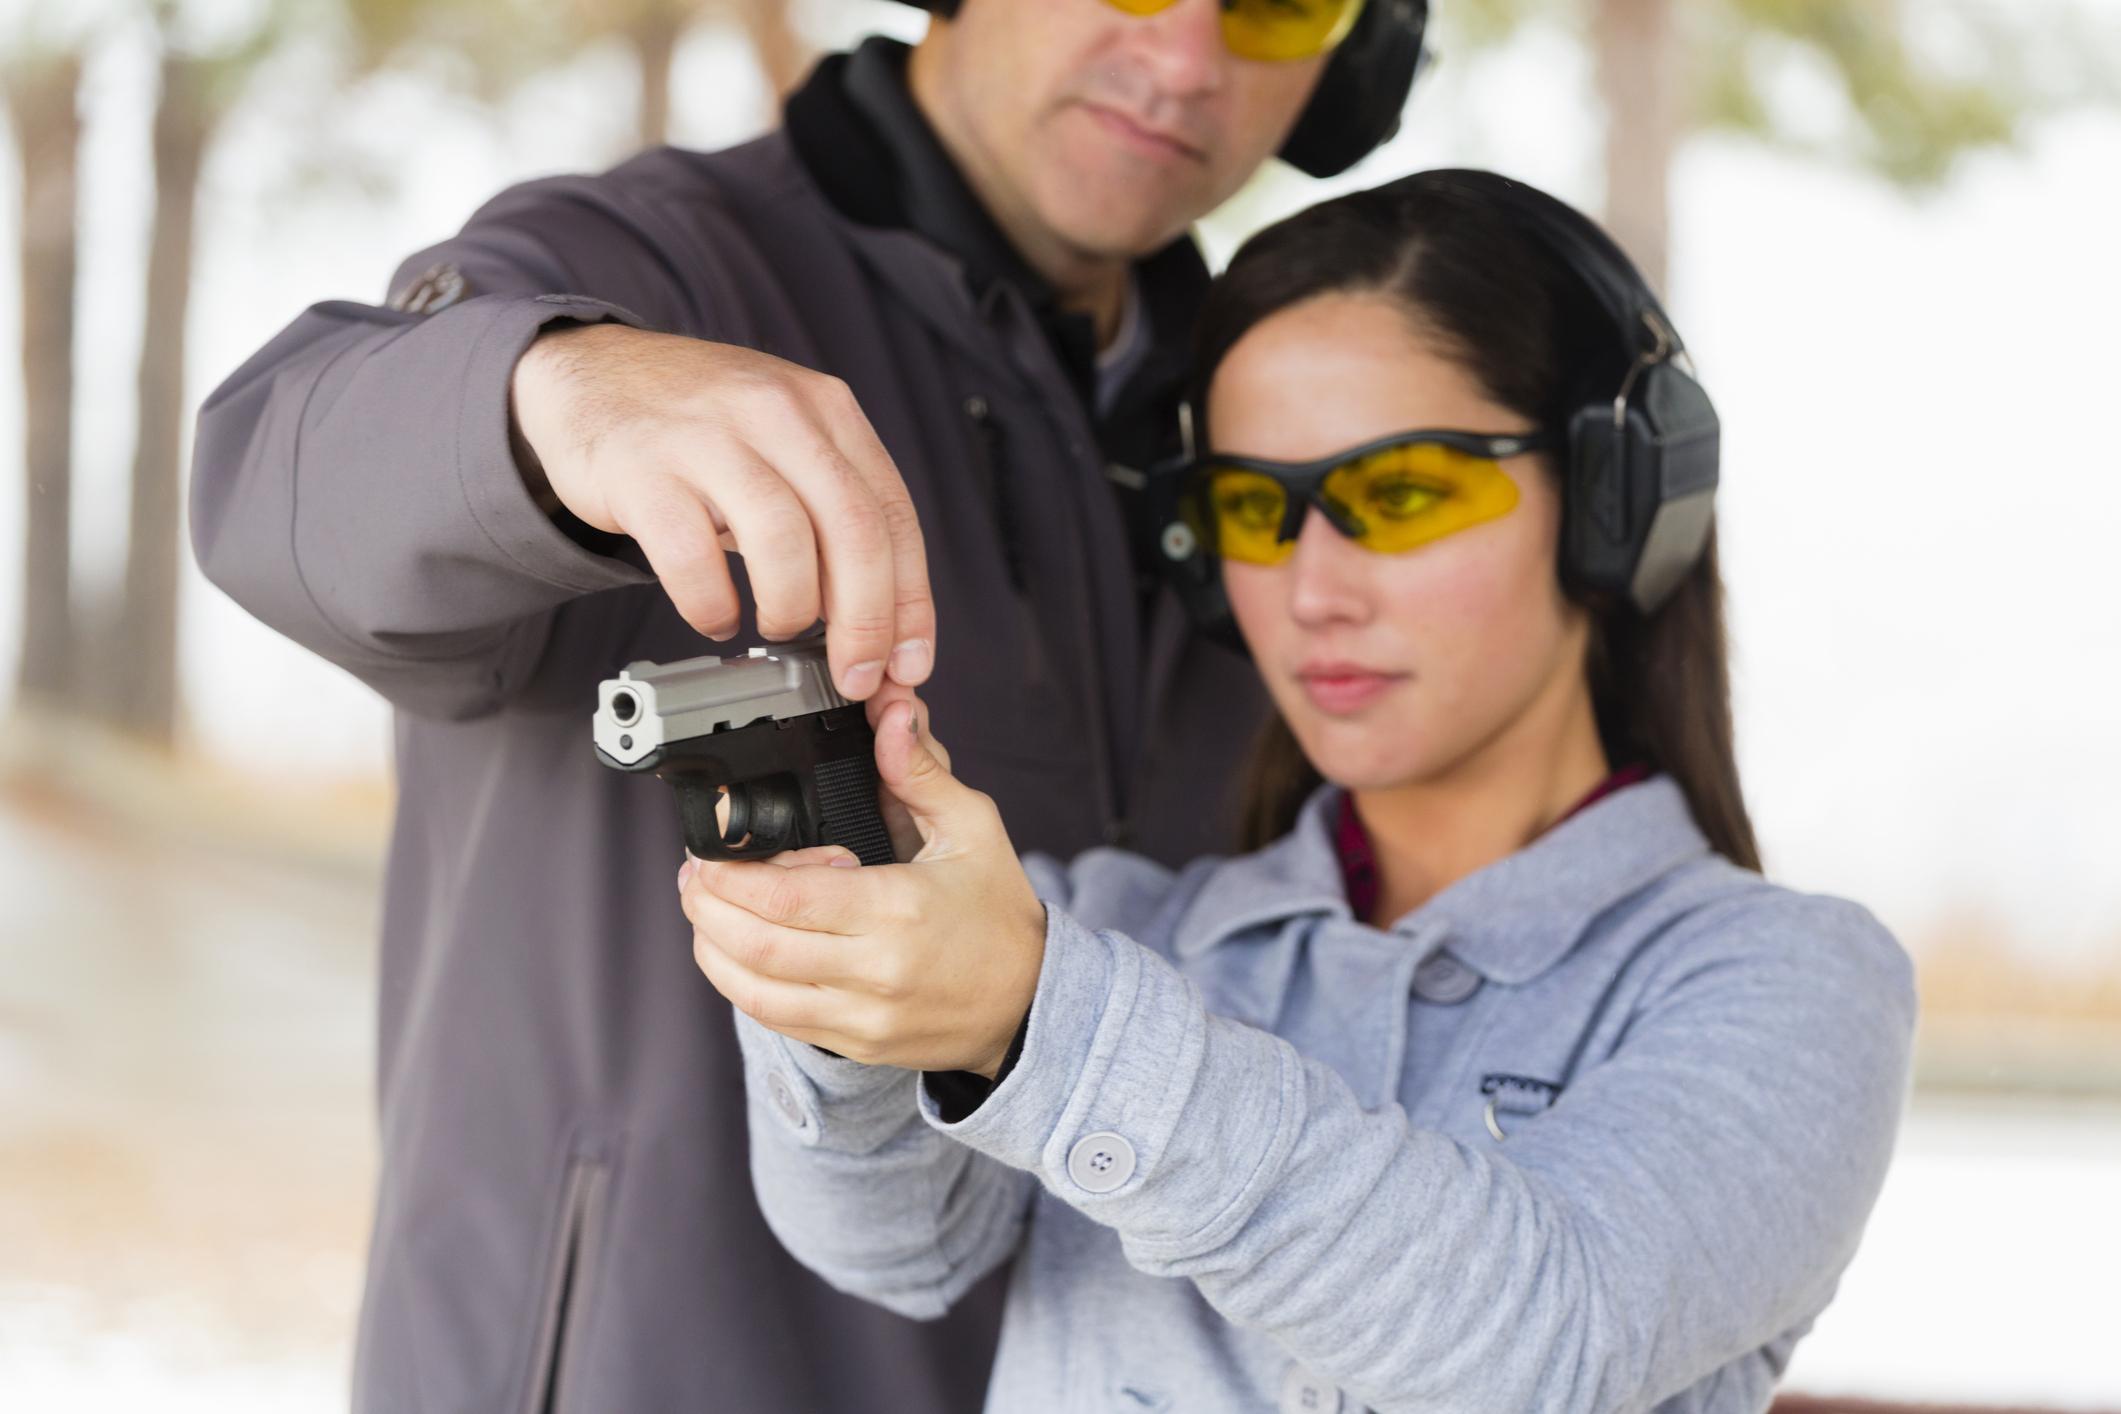 Woman receiving instruction at pistol range